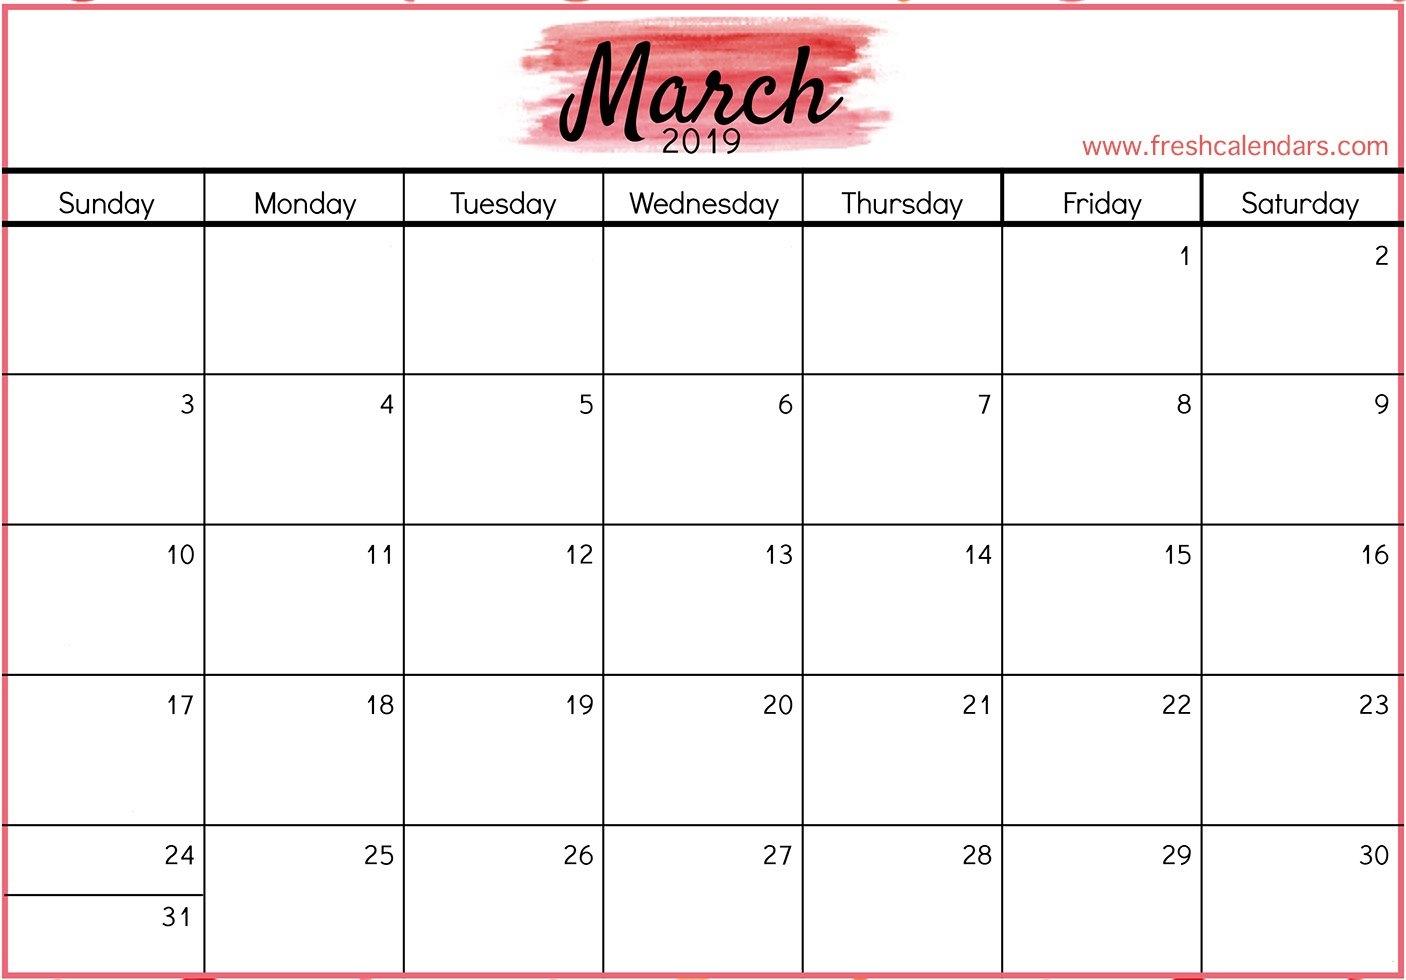 March 2019 Printable Calendars – Fresh Calendars Calendar 2019 March